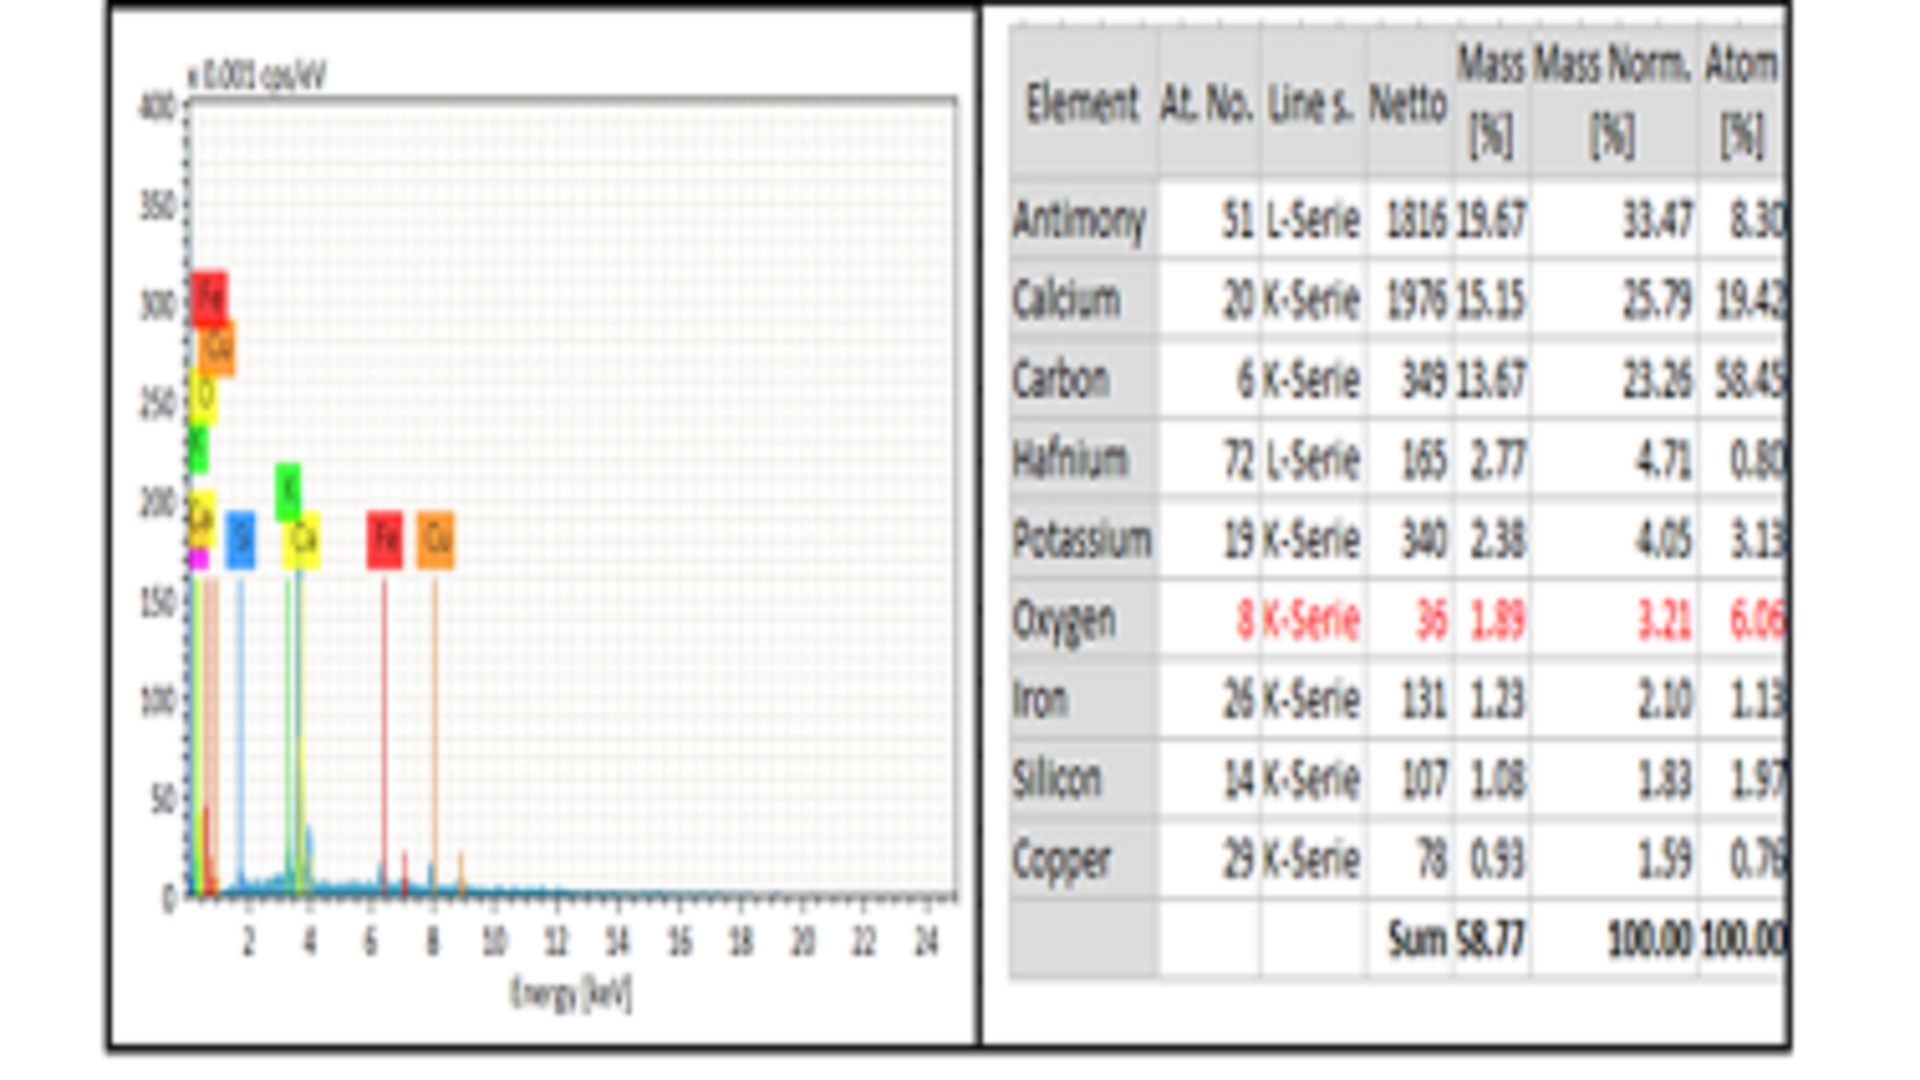 De-Fluoridation of Water by Using Dodonaea Viscosa Bark Biochar: An Isothermal and Kinetics Study